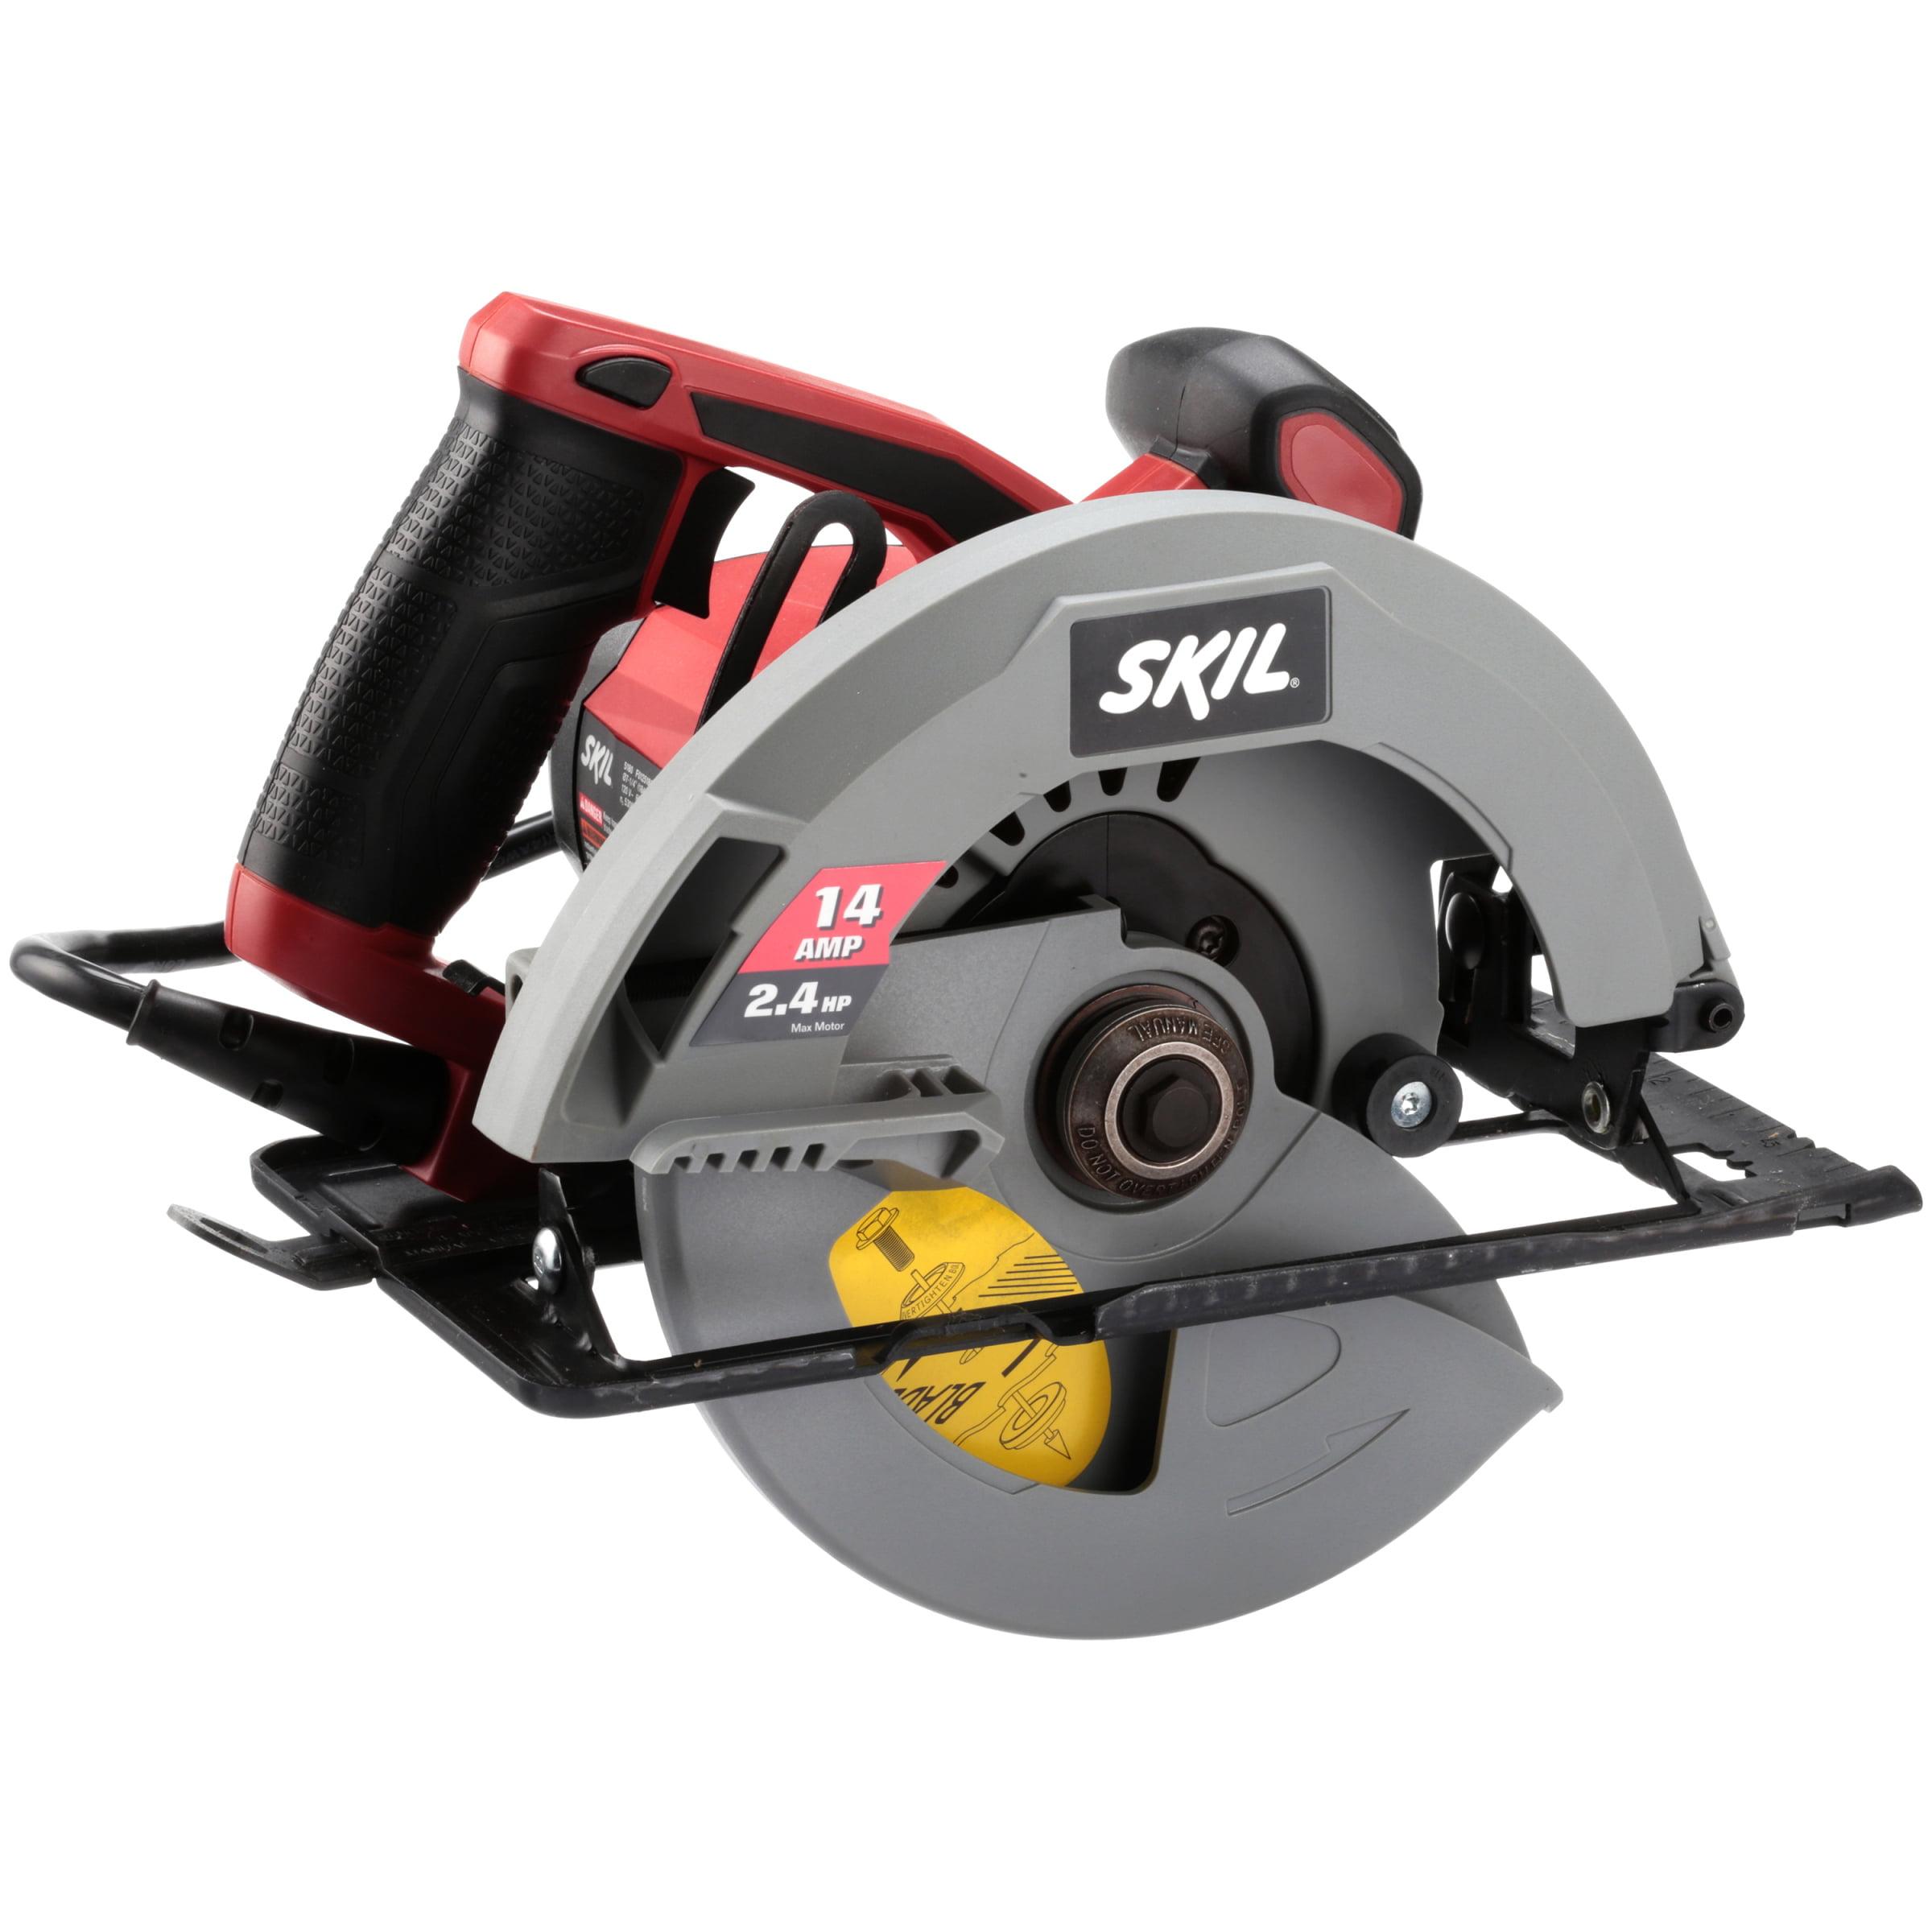 SKIL 5180-01 7-1/4-Inch 14 Amp Circular Saw